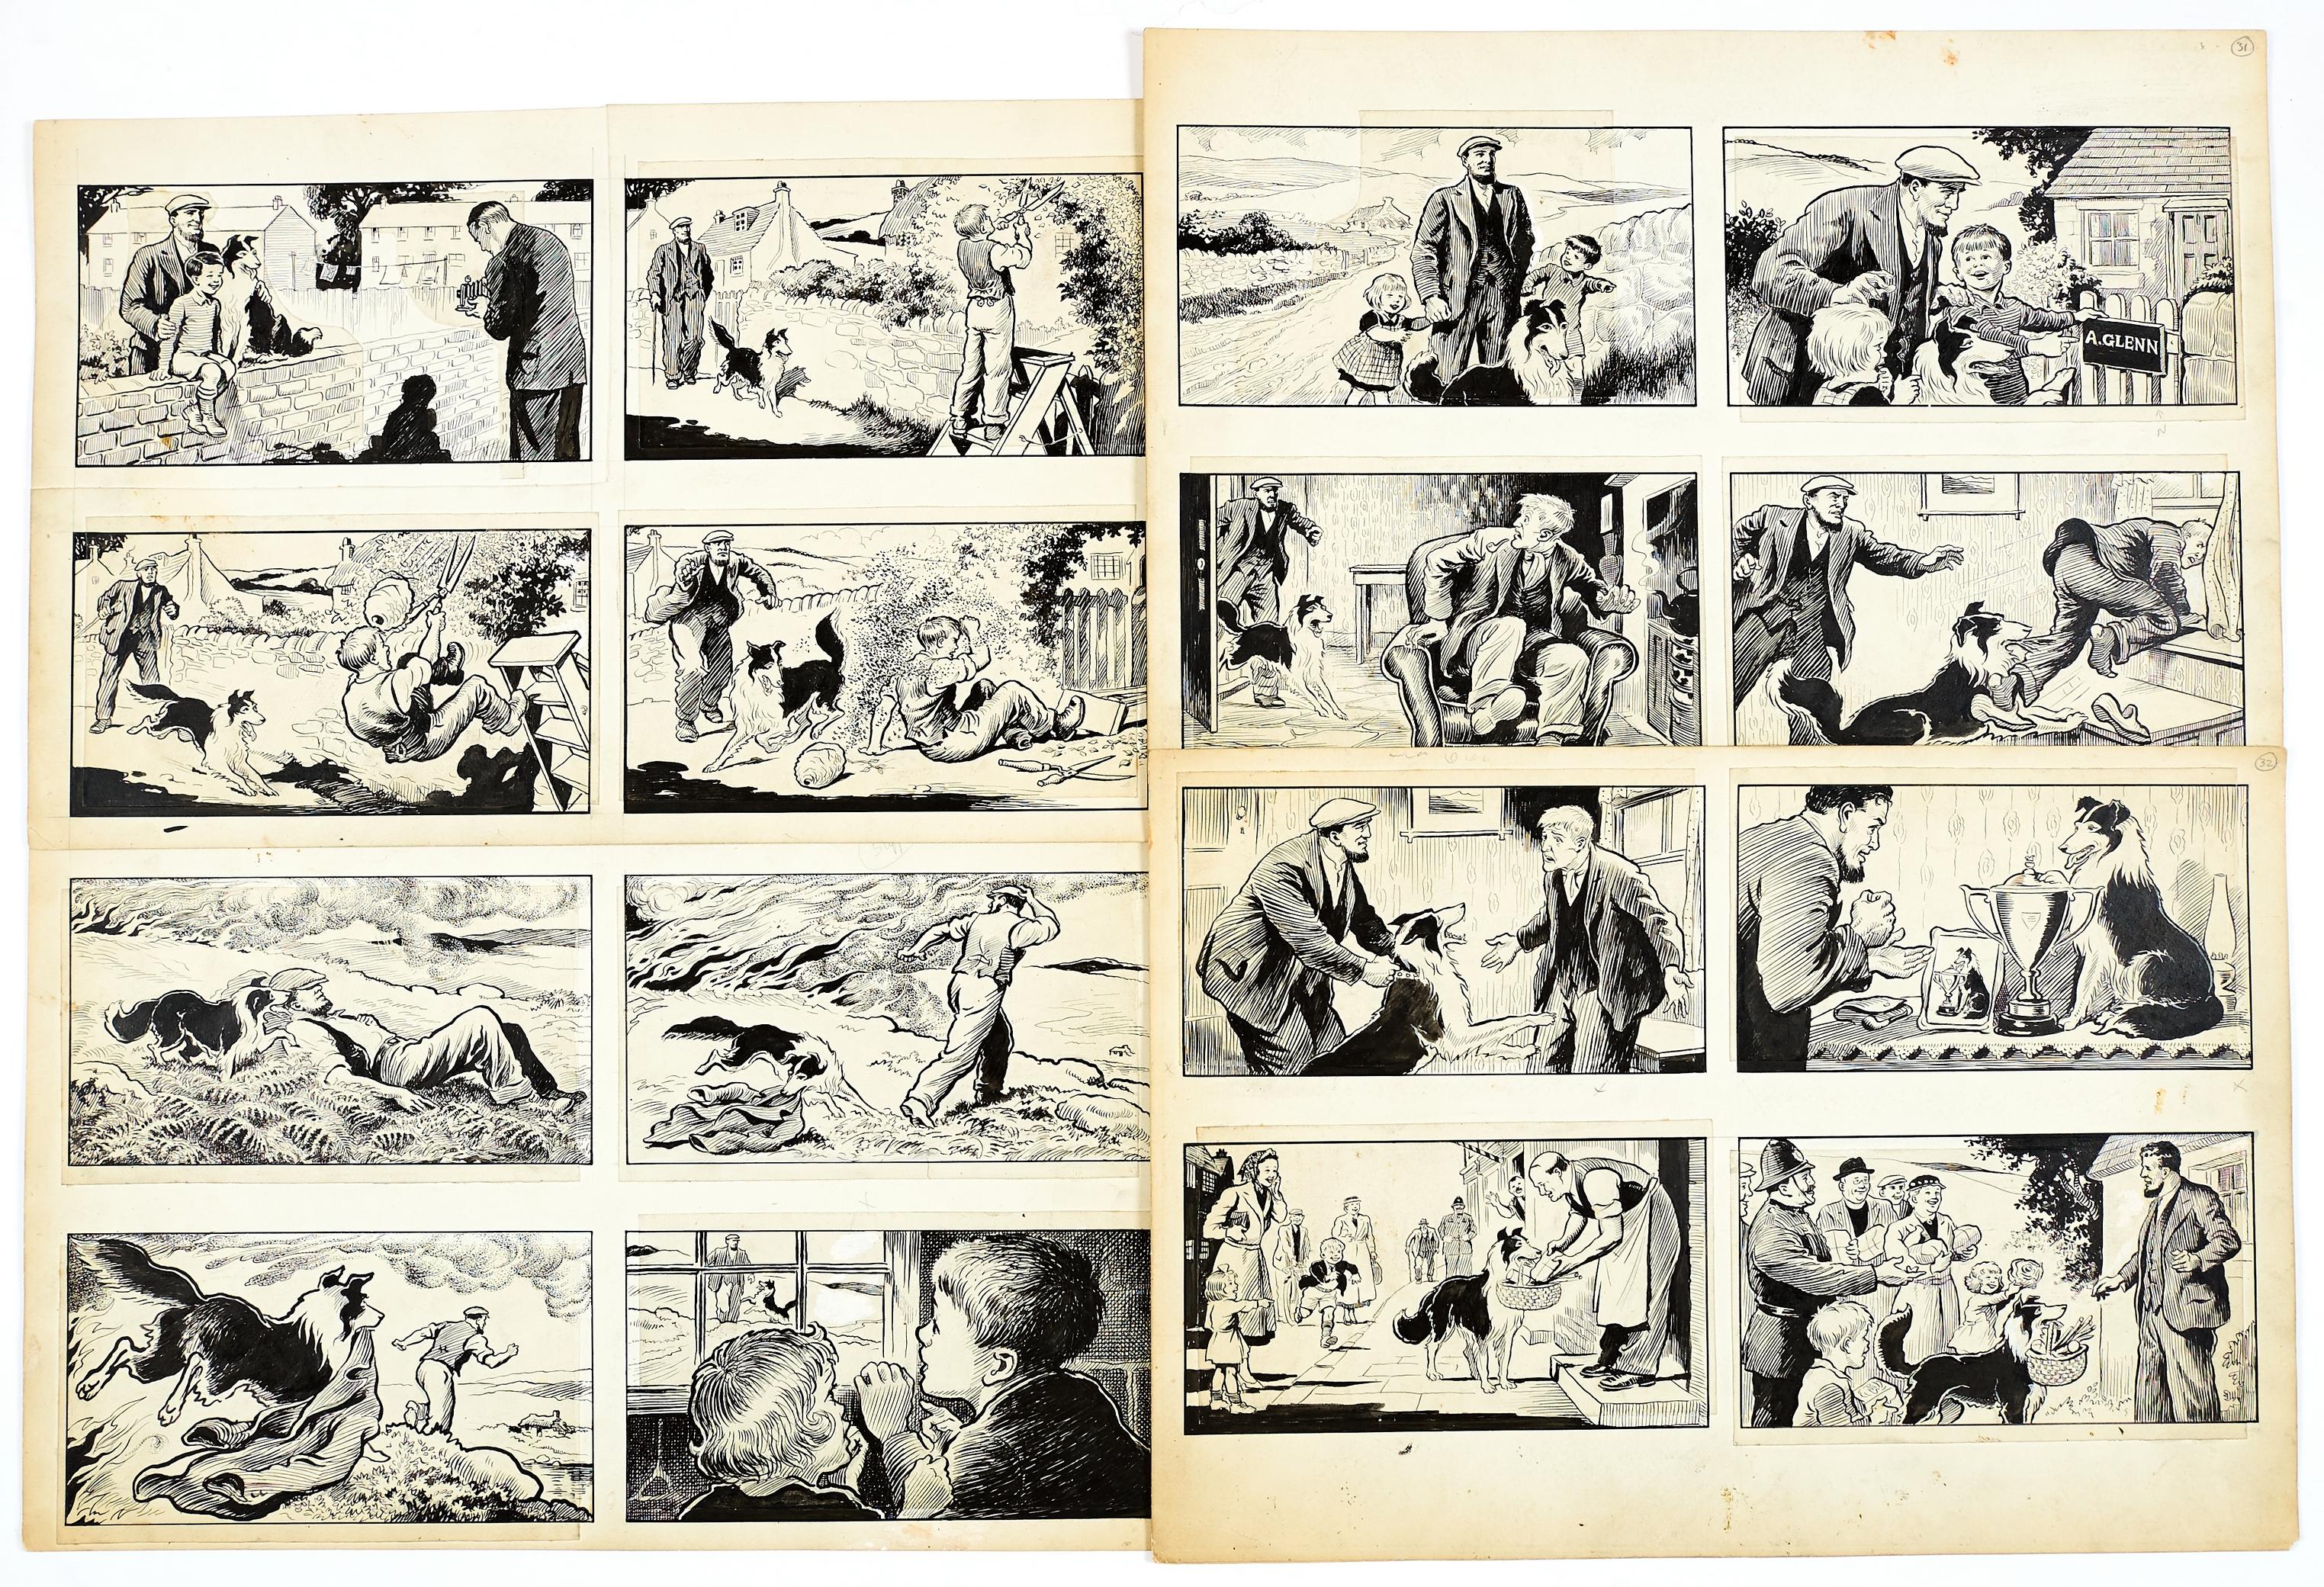 Lot 44 - Black Bob: 4 original 4-panel artworks (1950s) by Jack Prout for The Dandy/Black Bob Books. Indian